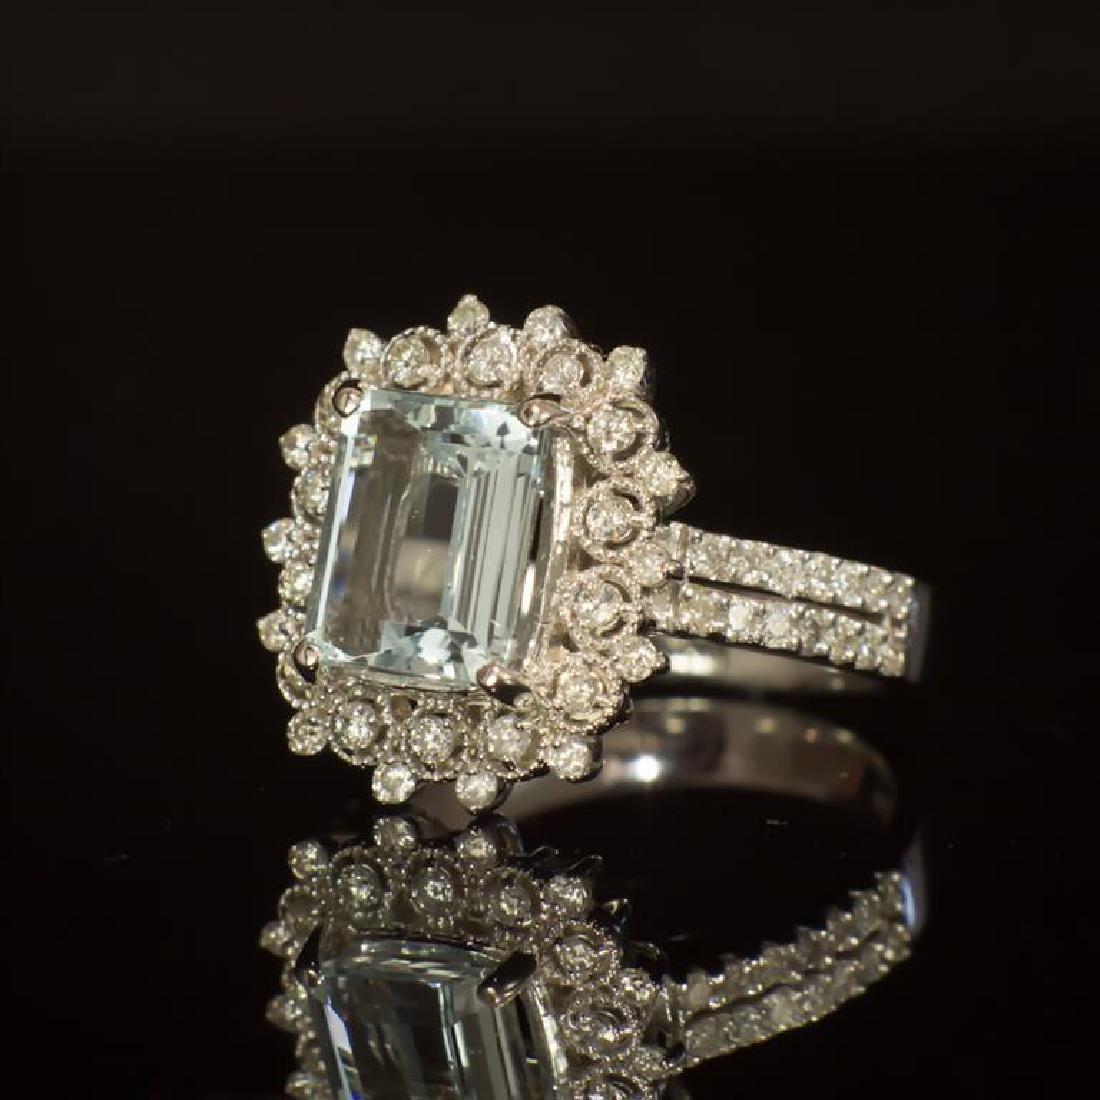 14K Gold 2.42ct Aquamarine 0.79ct Diamond Ring - 2